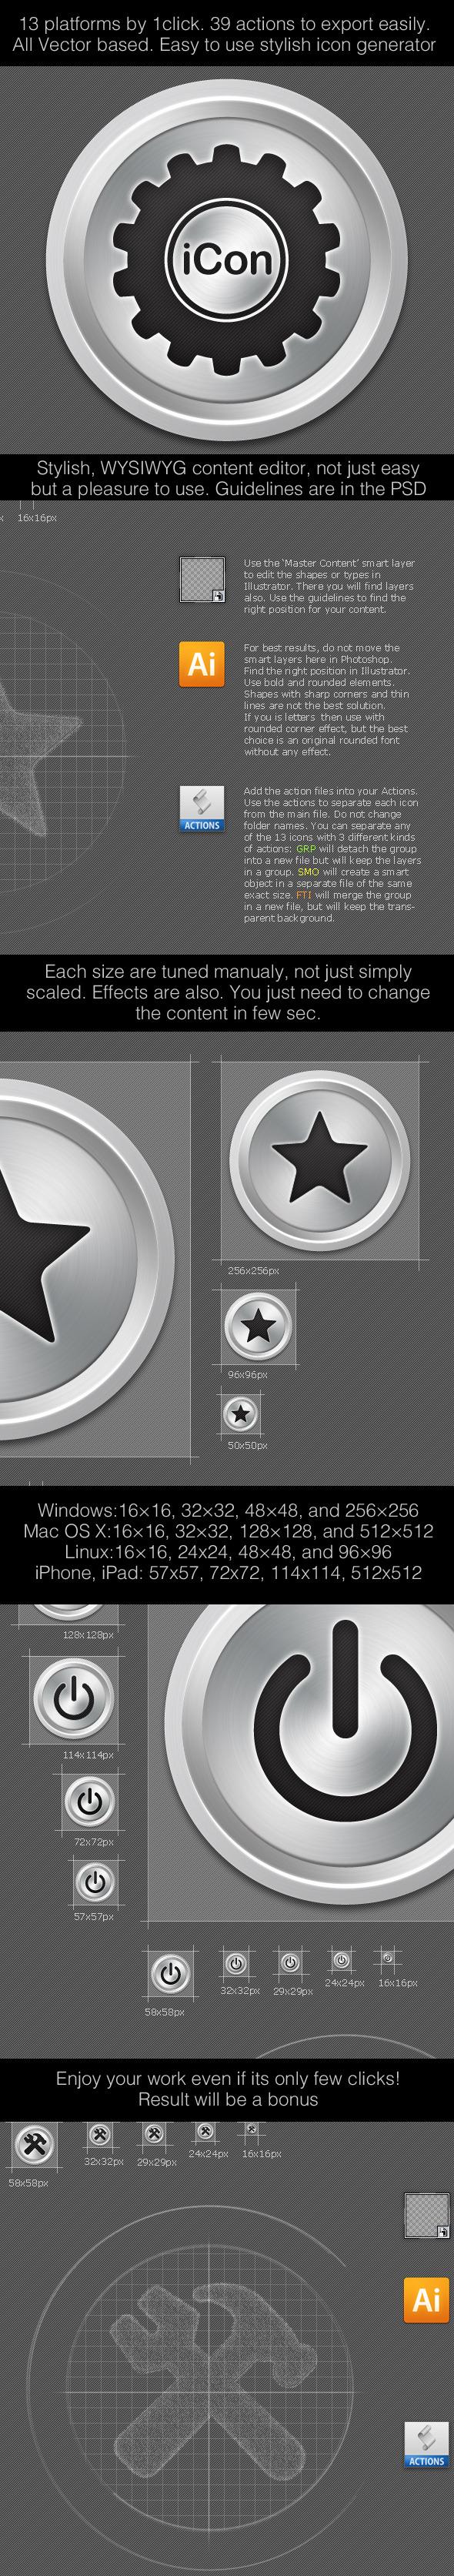 iCon13 Icon Generator for 13 Standard Sizes & OS